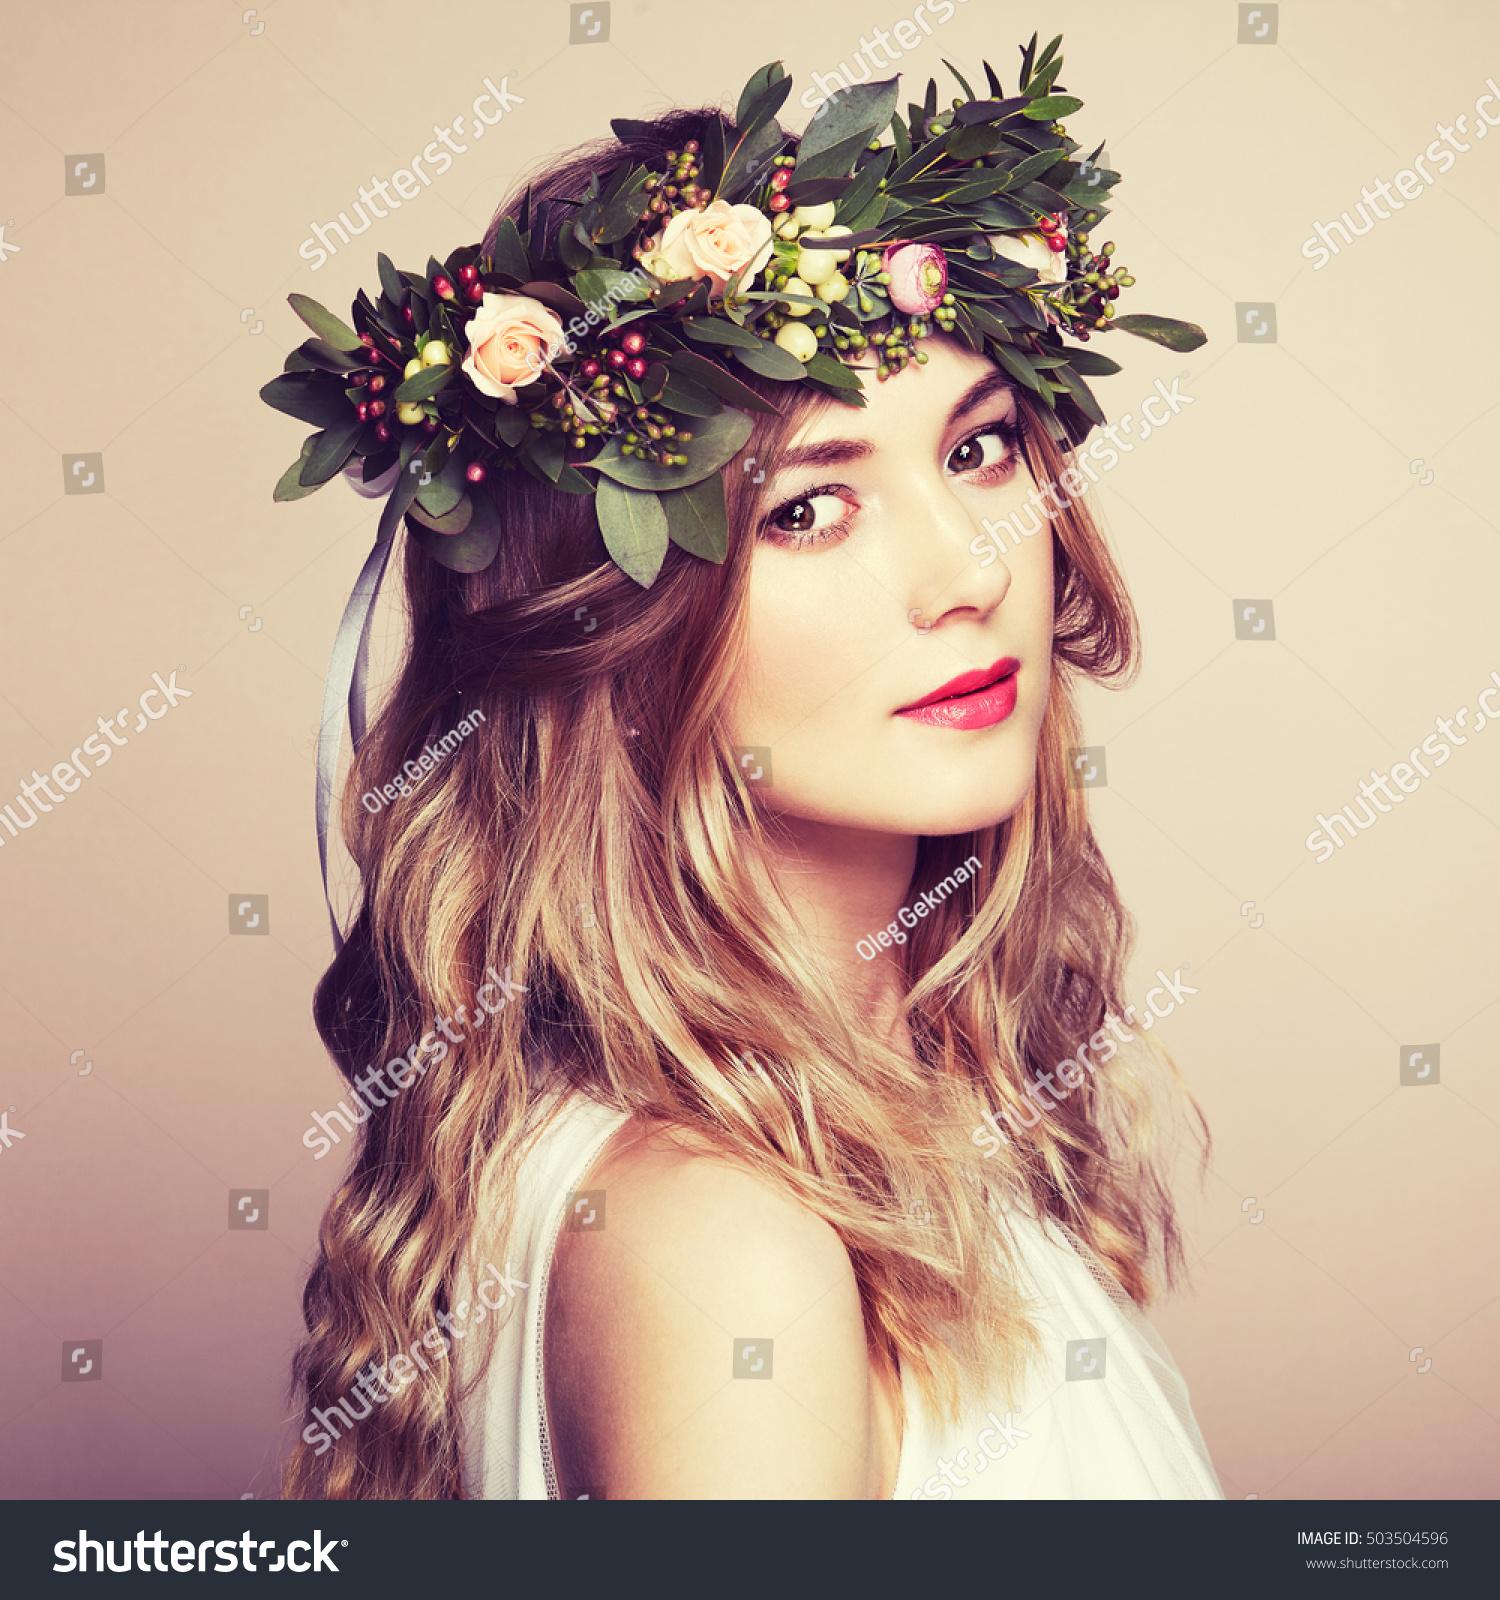 Beautiful blonde woman flower wreath on stock photo image royalty beautiful blonde woman with flower wreath on her head beauty girl with flowers hairstyle izmirmasajfo